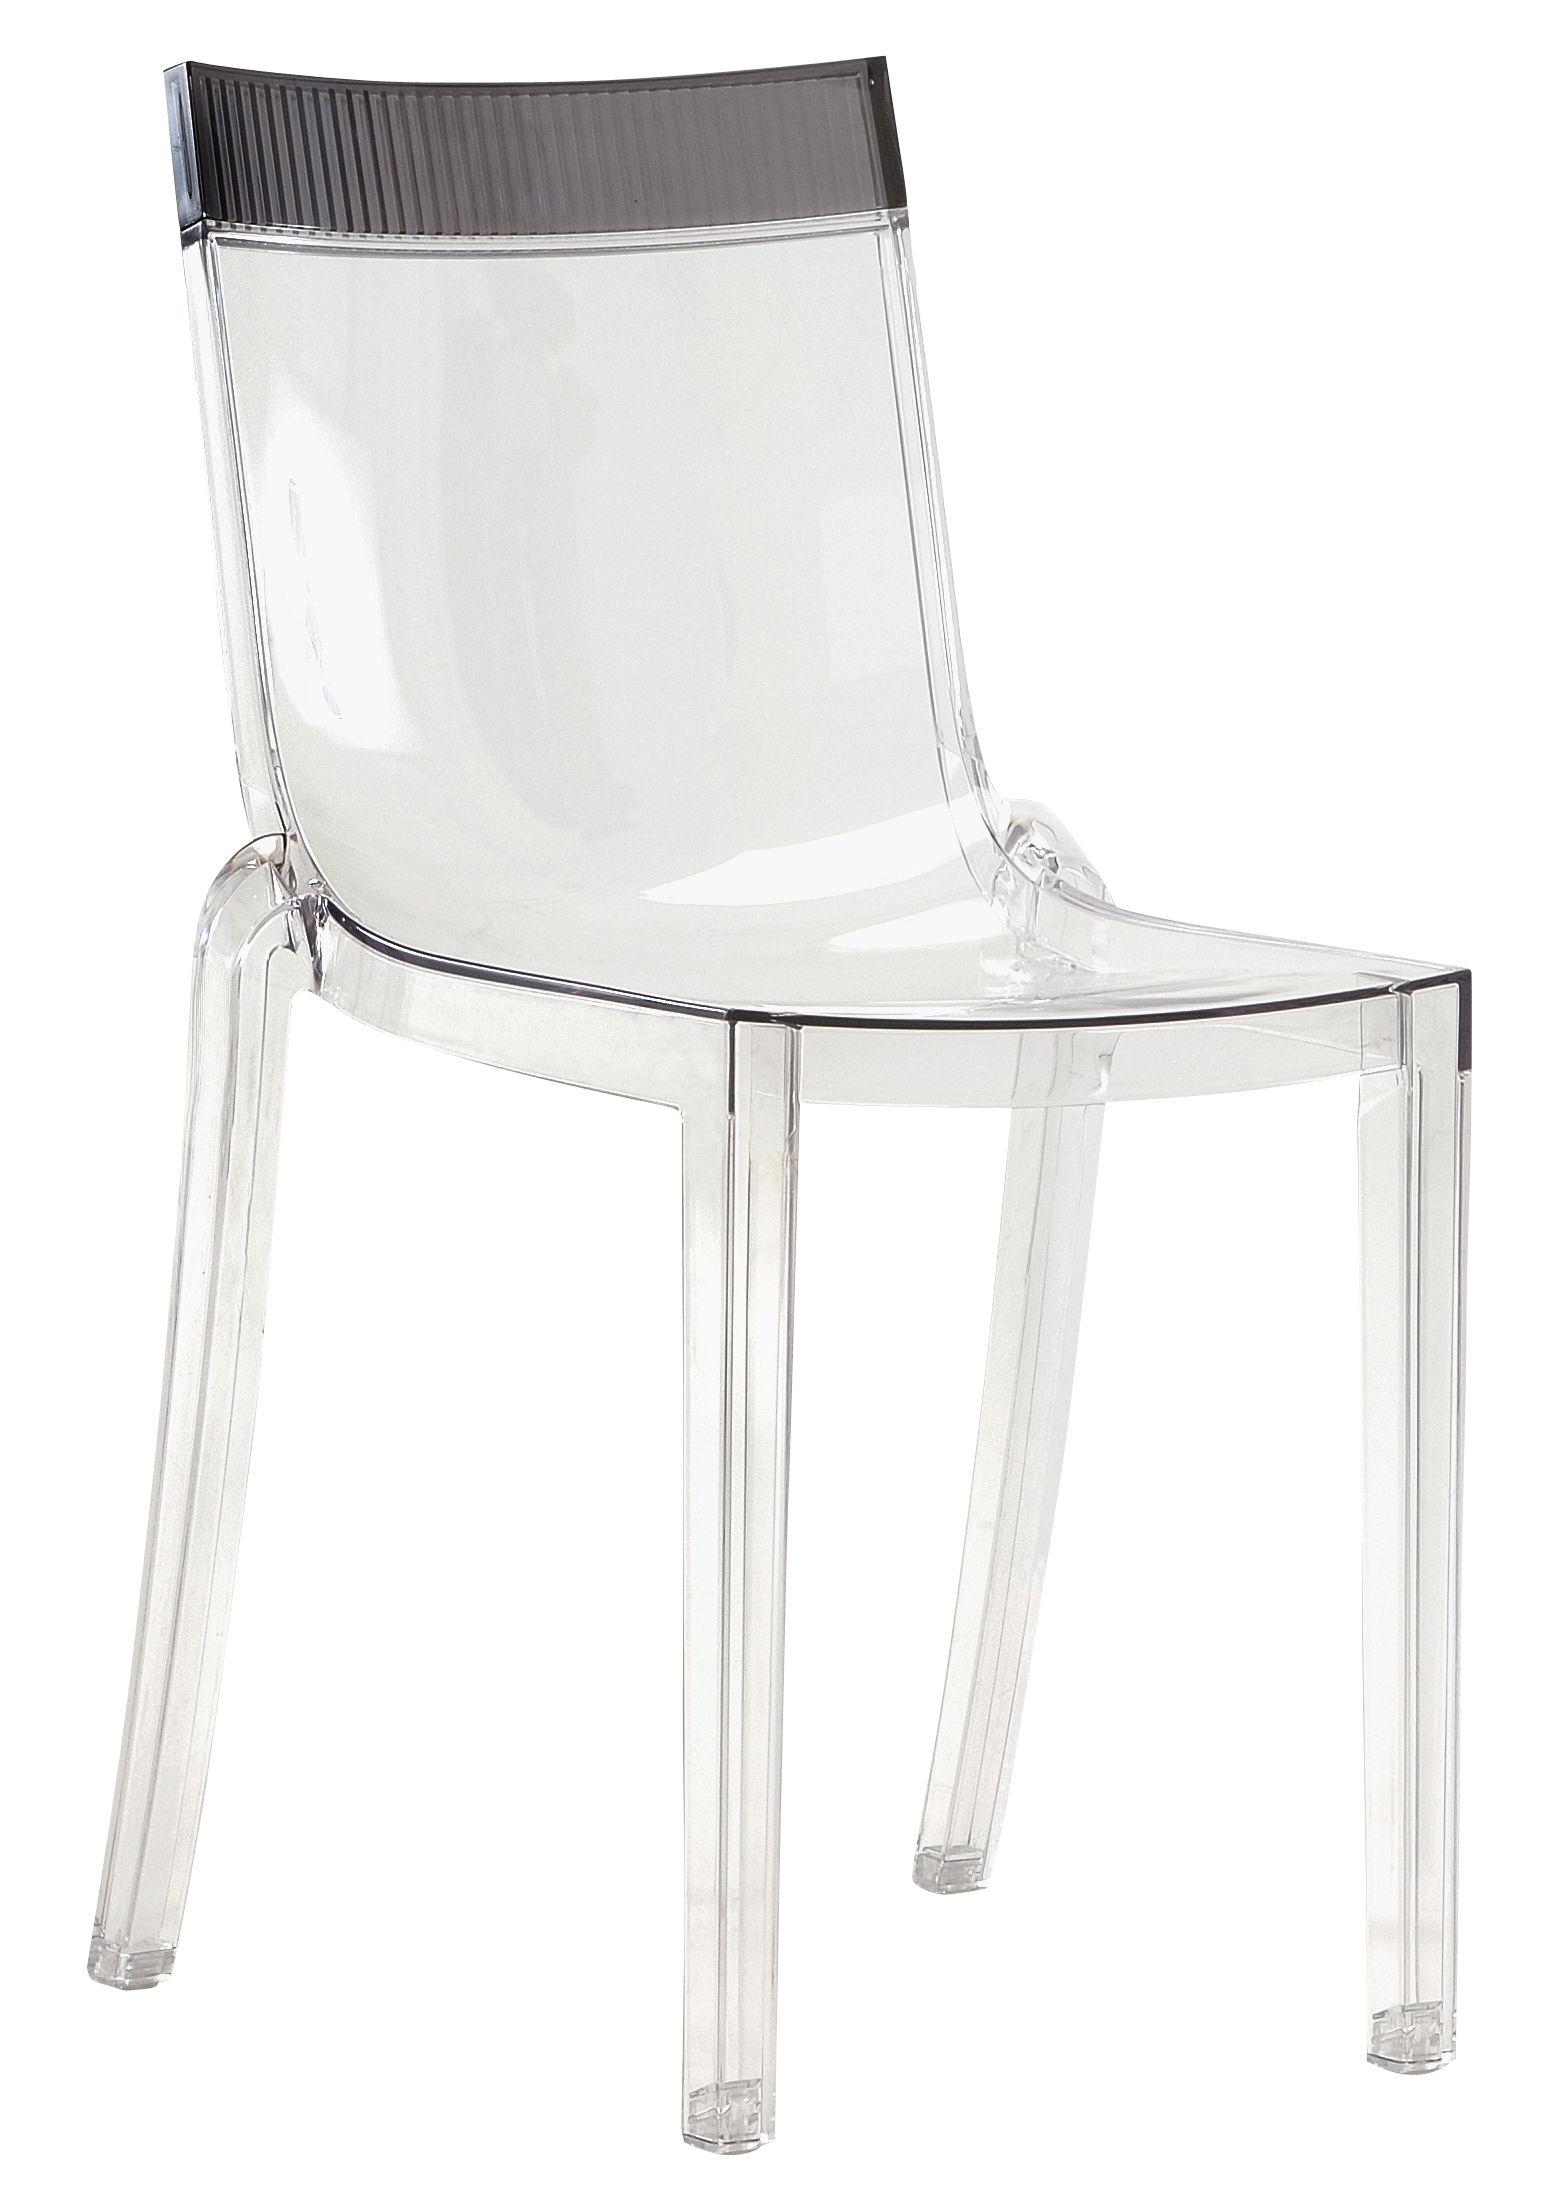 chaise empilable hi cut transparente polycarbonate cristal rouge kartell. Black Bedroom Furniture Sets. Home Design Ideas